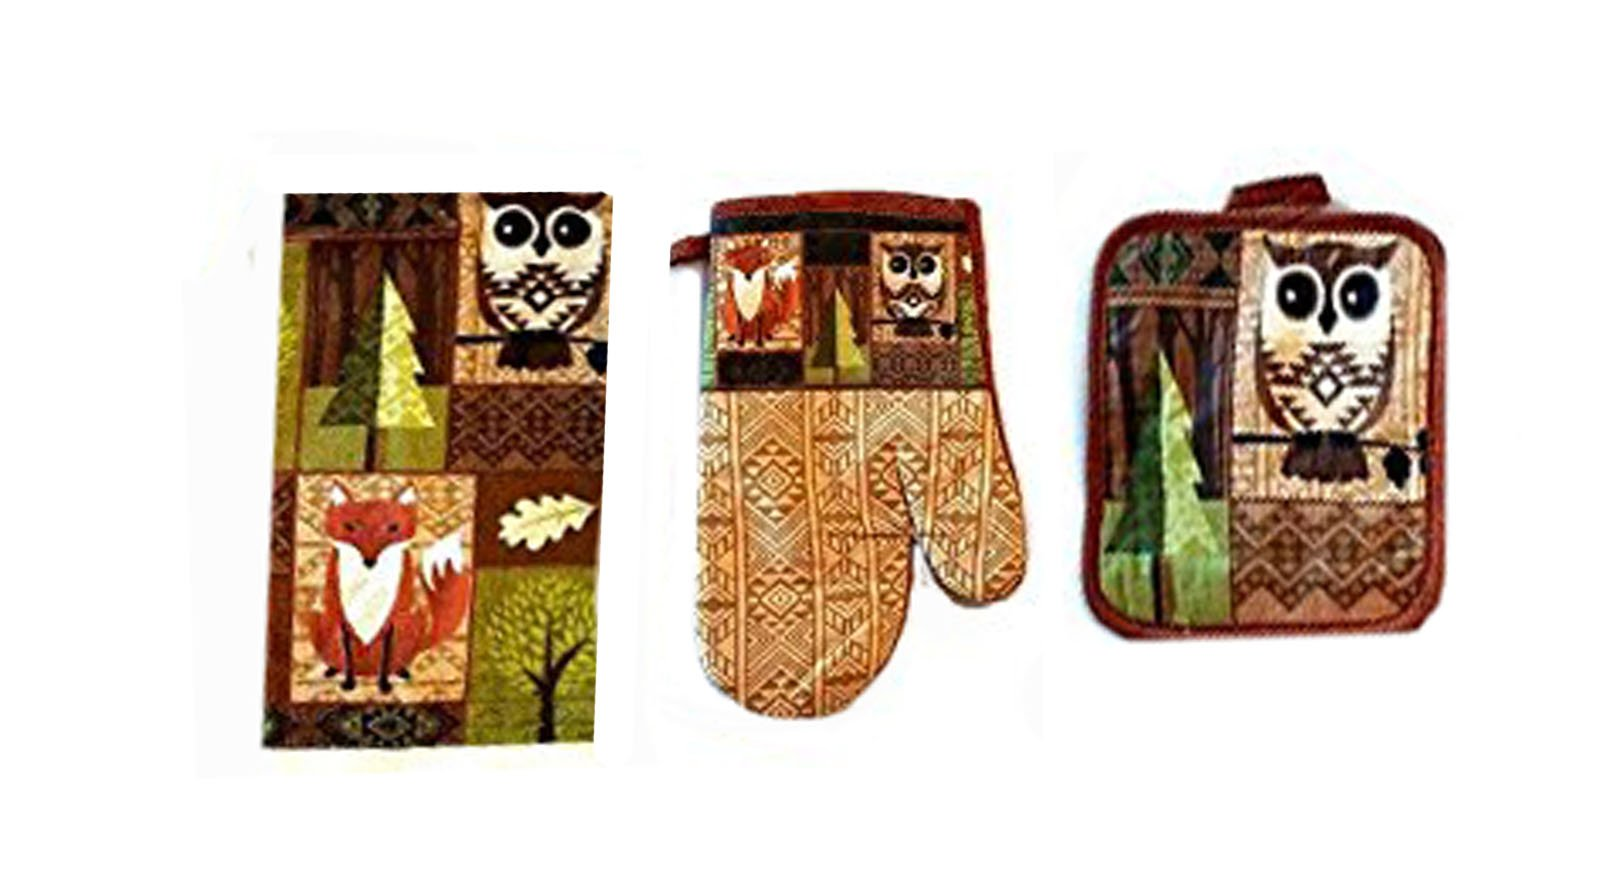 3 Piece Kitchen Set - Towel Potholder Oven Mitt - Woodland Animal Theme with Fox and Owl Design, Cotton Construction